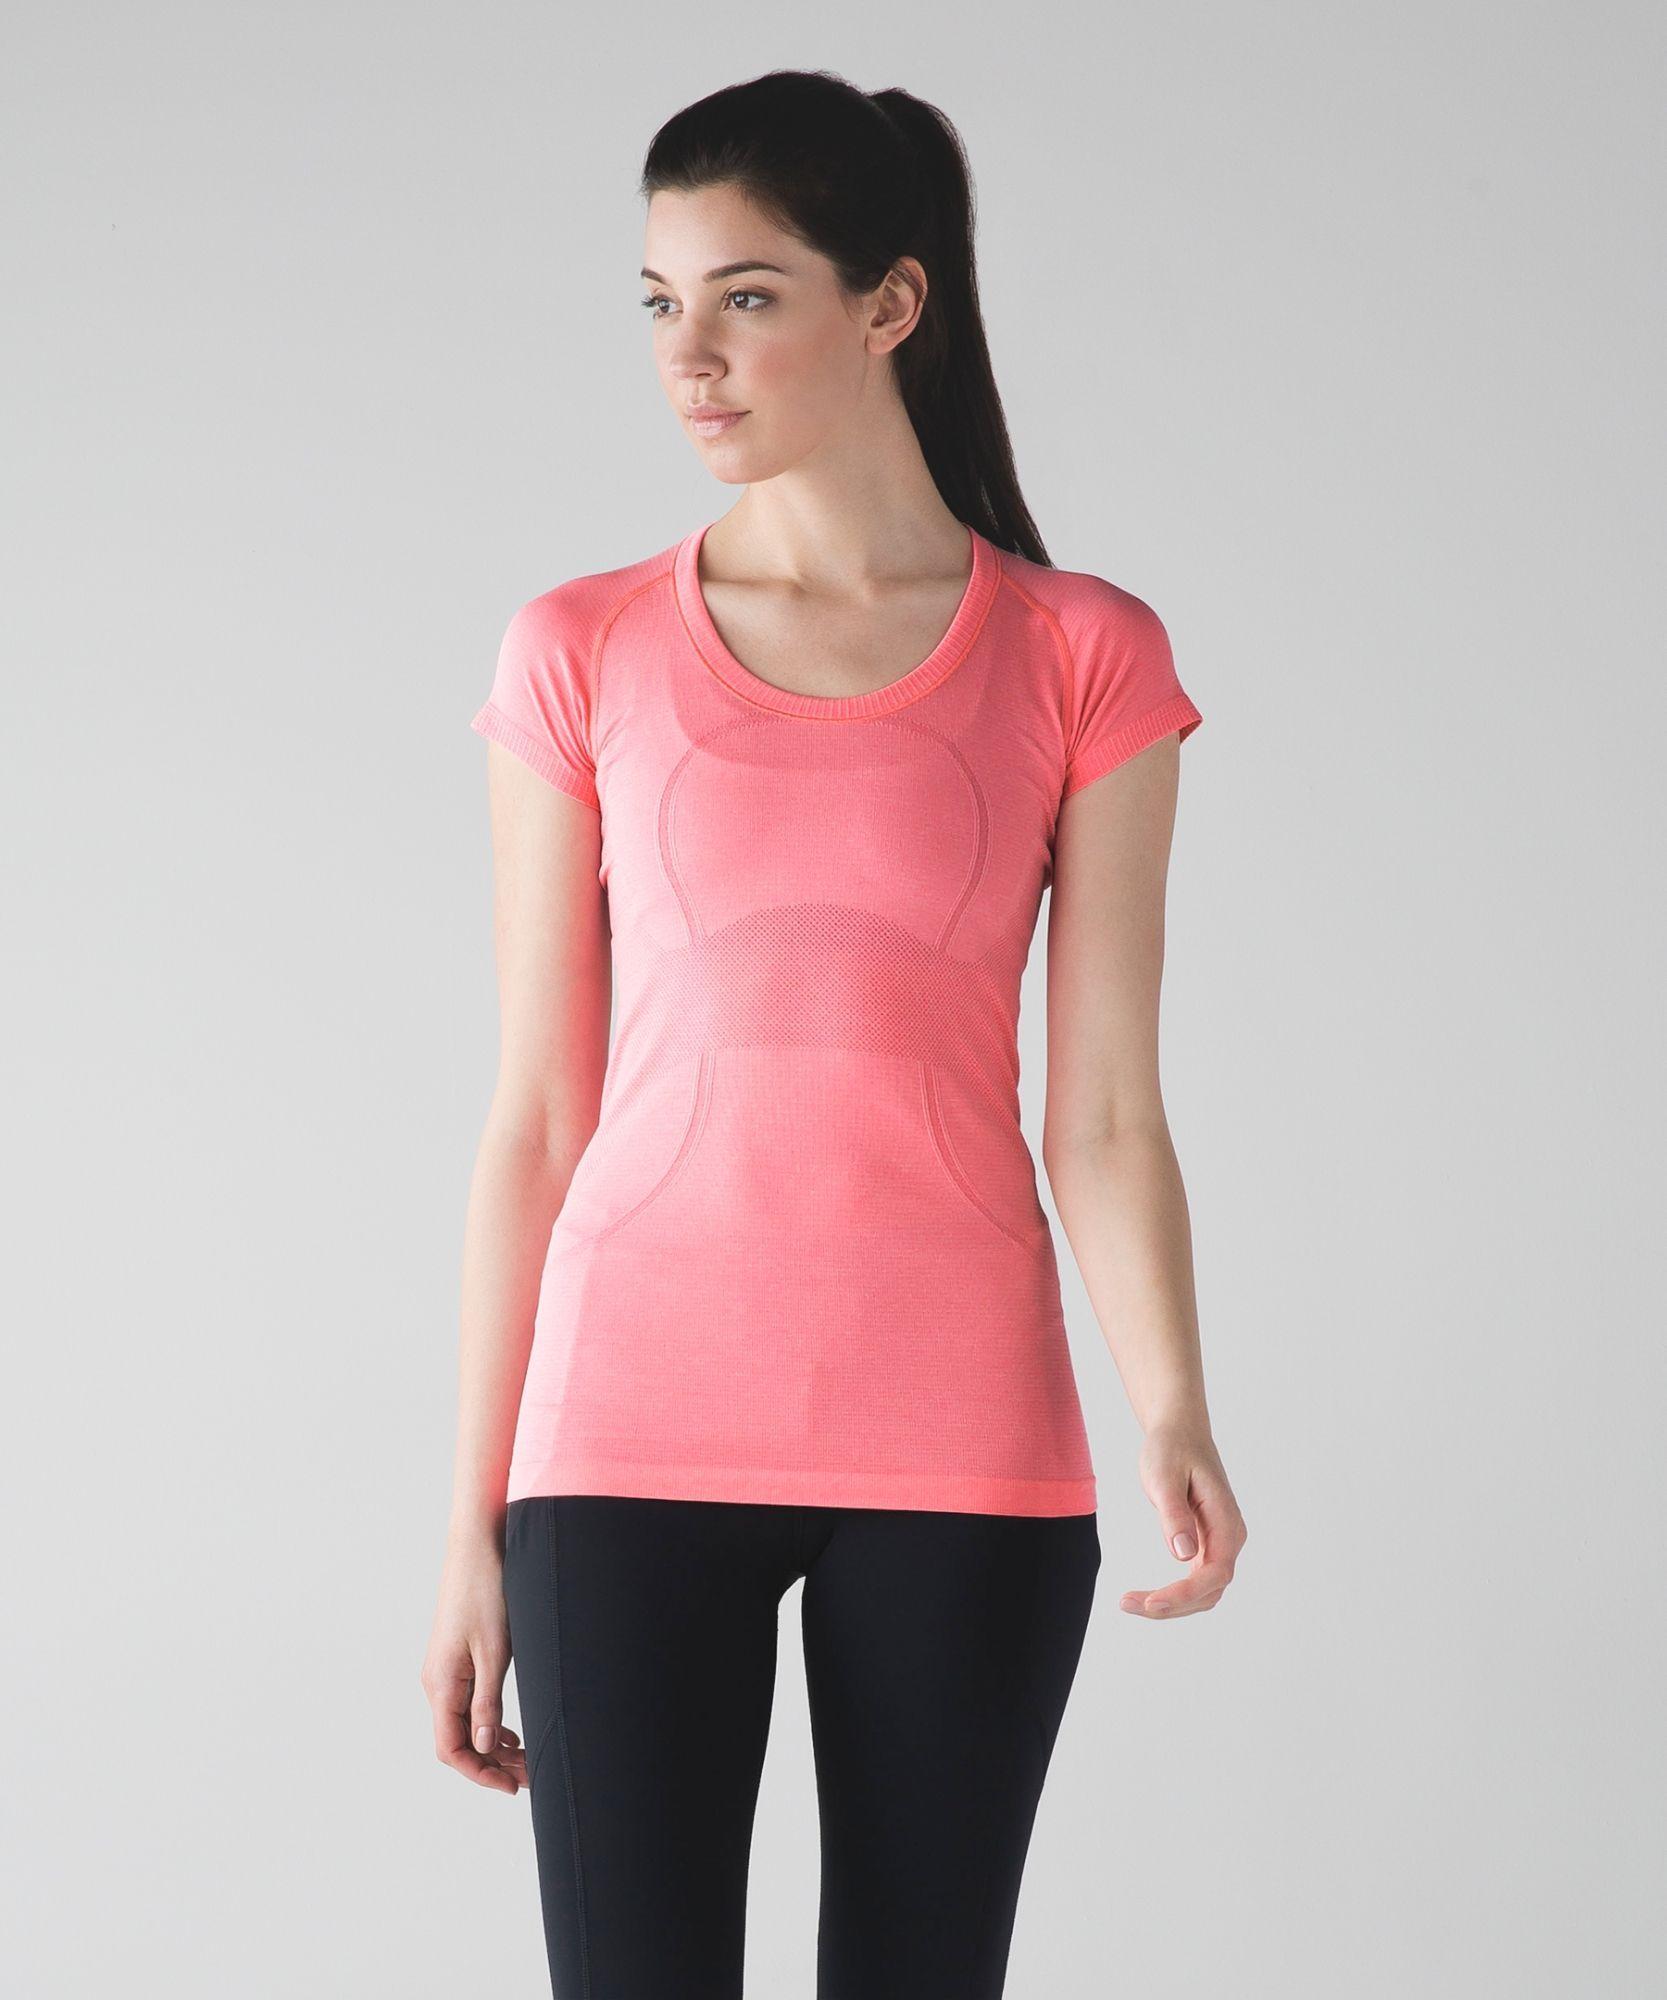 Women's Short Sleeve Top - Swiftly Tech Short Sleeve Scoop *Online Onl